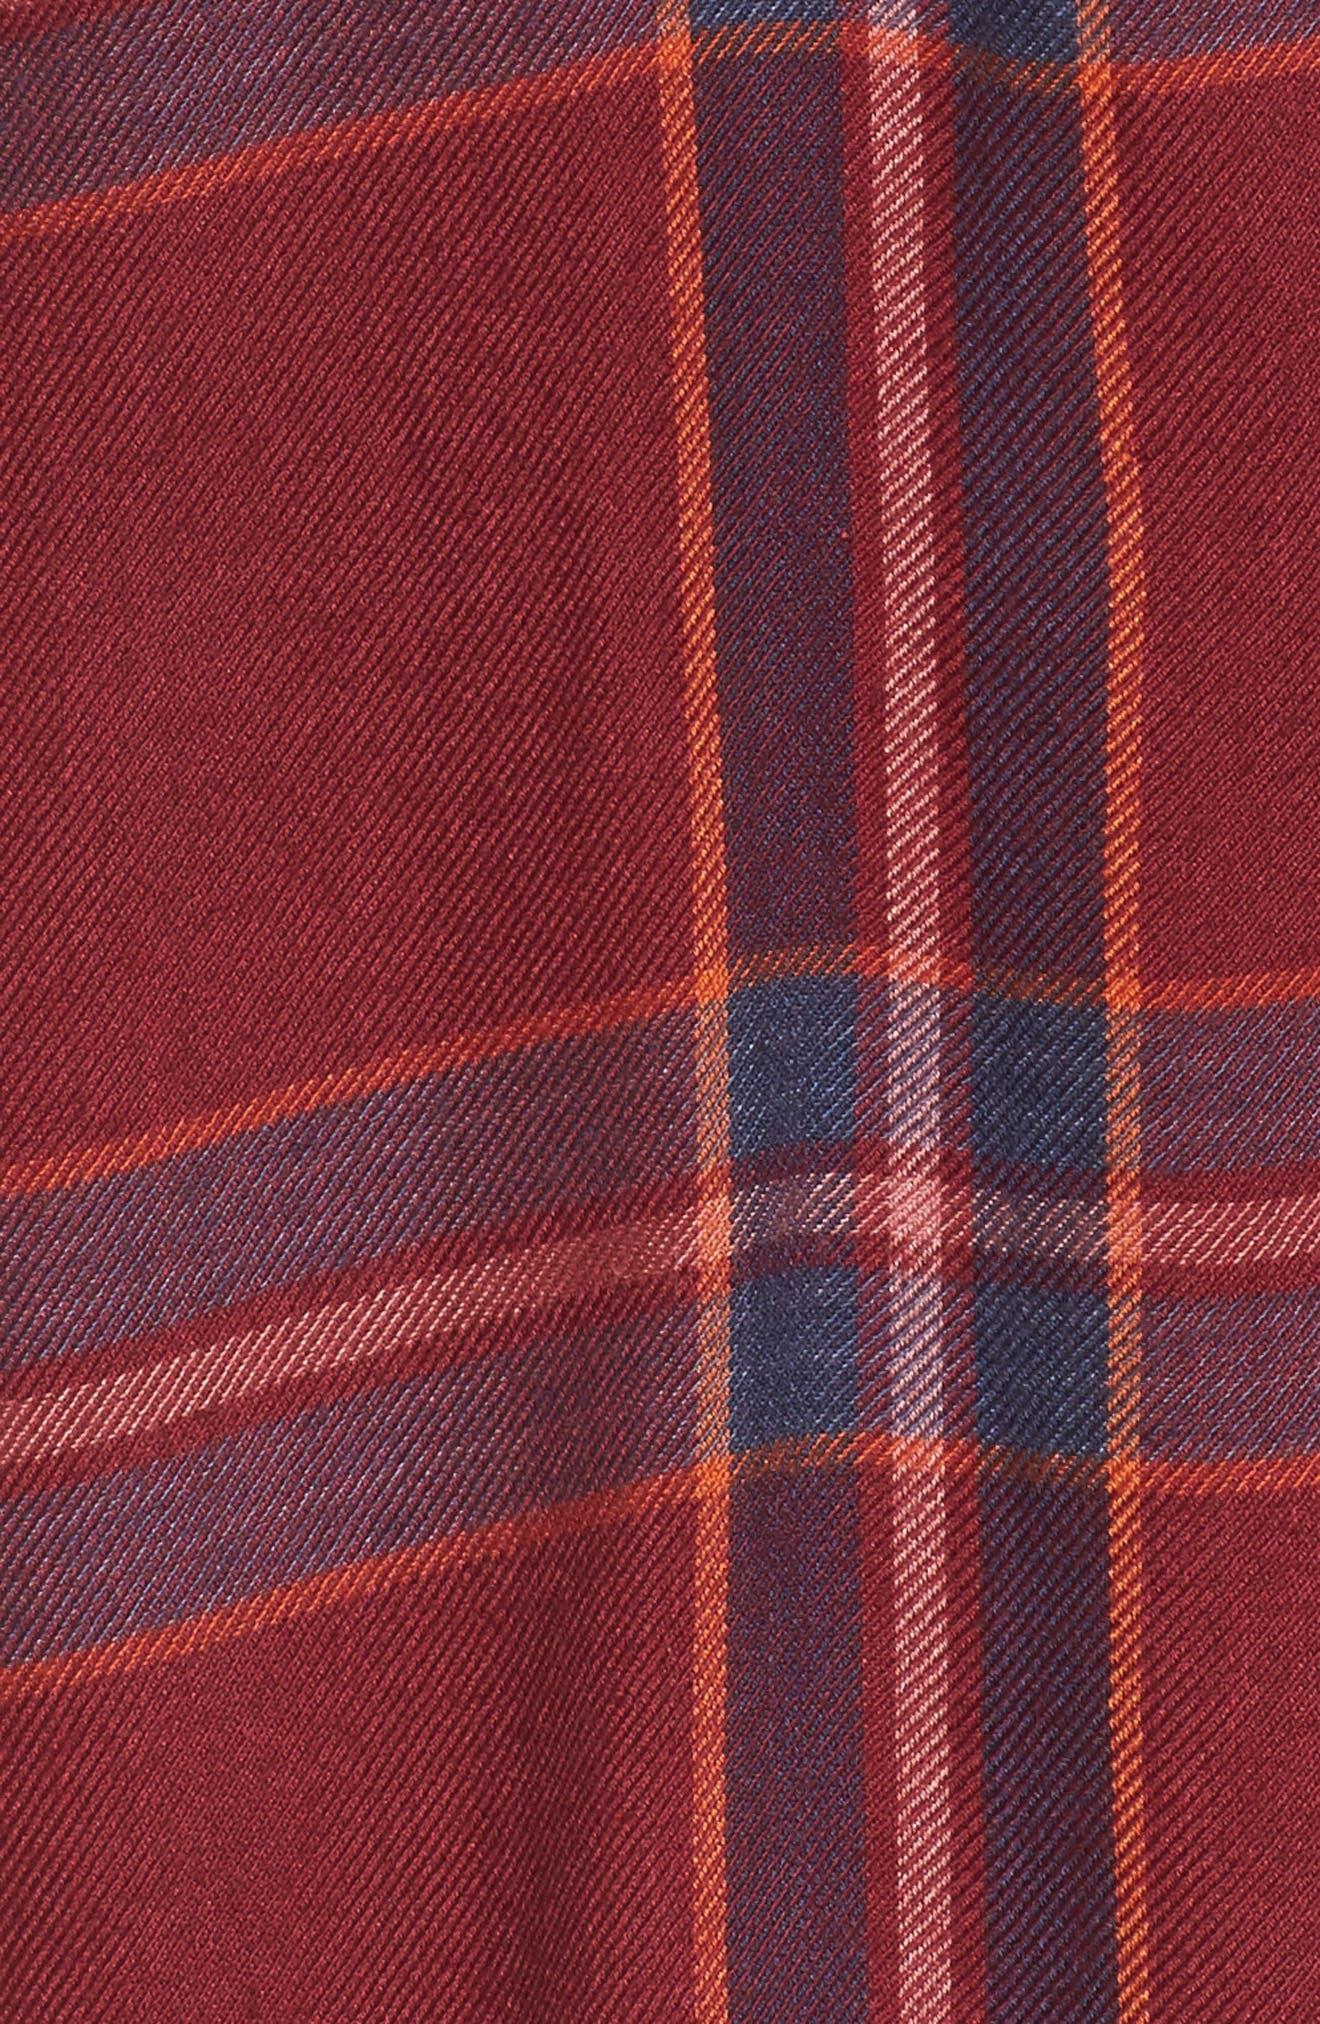 Plaid Popover Shirt,                             Alternate thumbnail 5, color,                             Red Multi